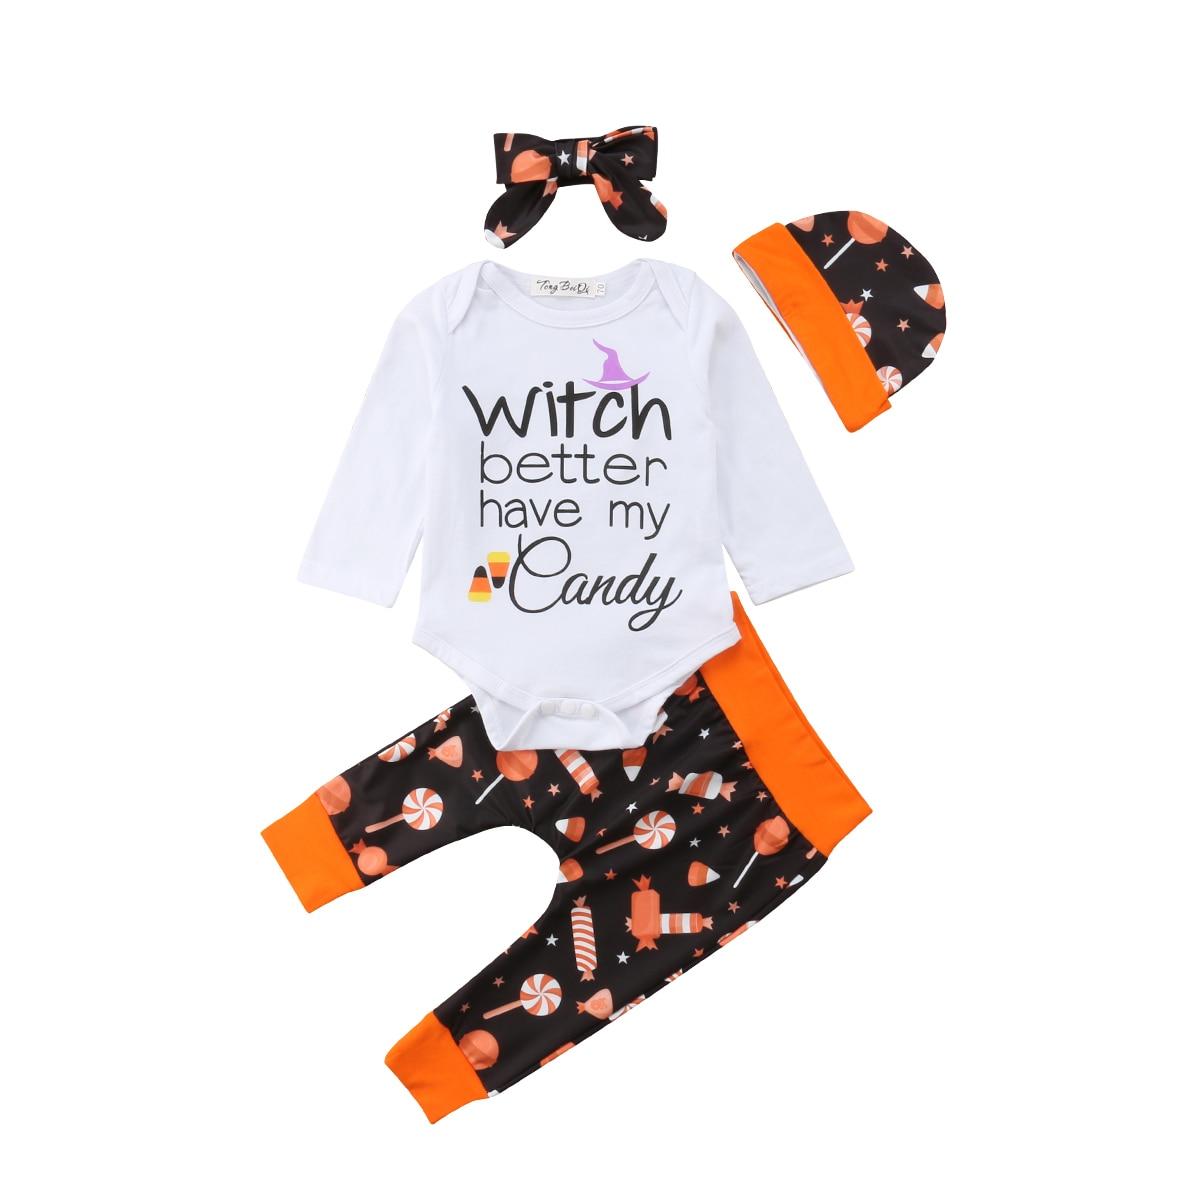 Halloween Baby Girls Boys 4PCS Set Clothes Long Sleeve Romper Jumpsuit Long Pants Hat Headband Outfit